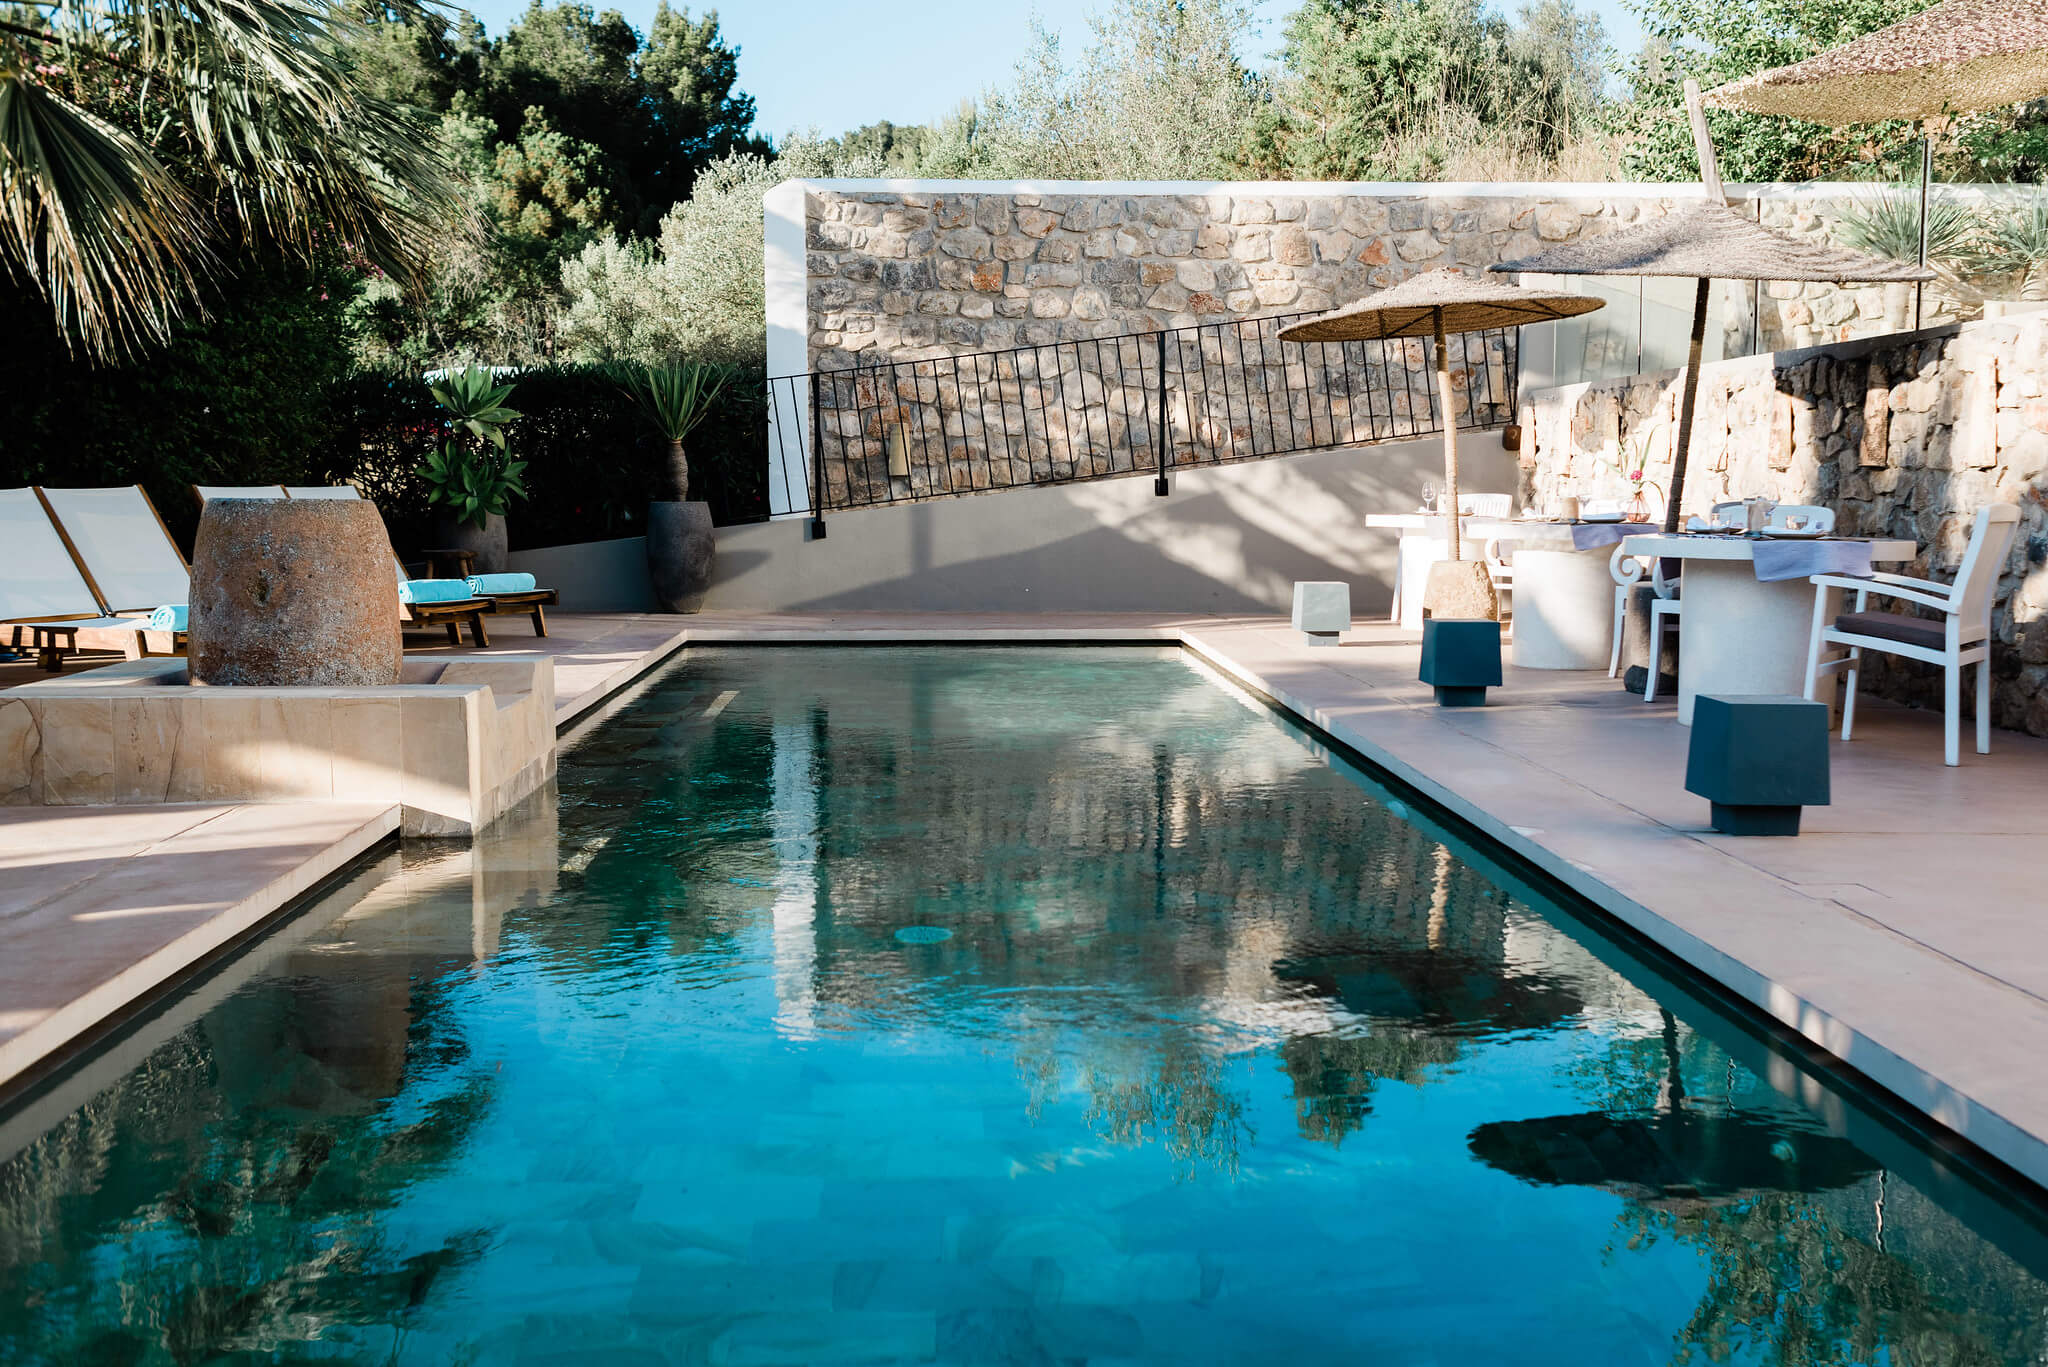 https://www.white-ibiza.com/wp-content/uploads/2020/03/white-ibiza-boutique-hotels-the-giri-residence-2020-04.jpg